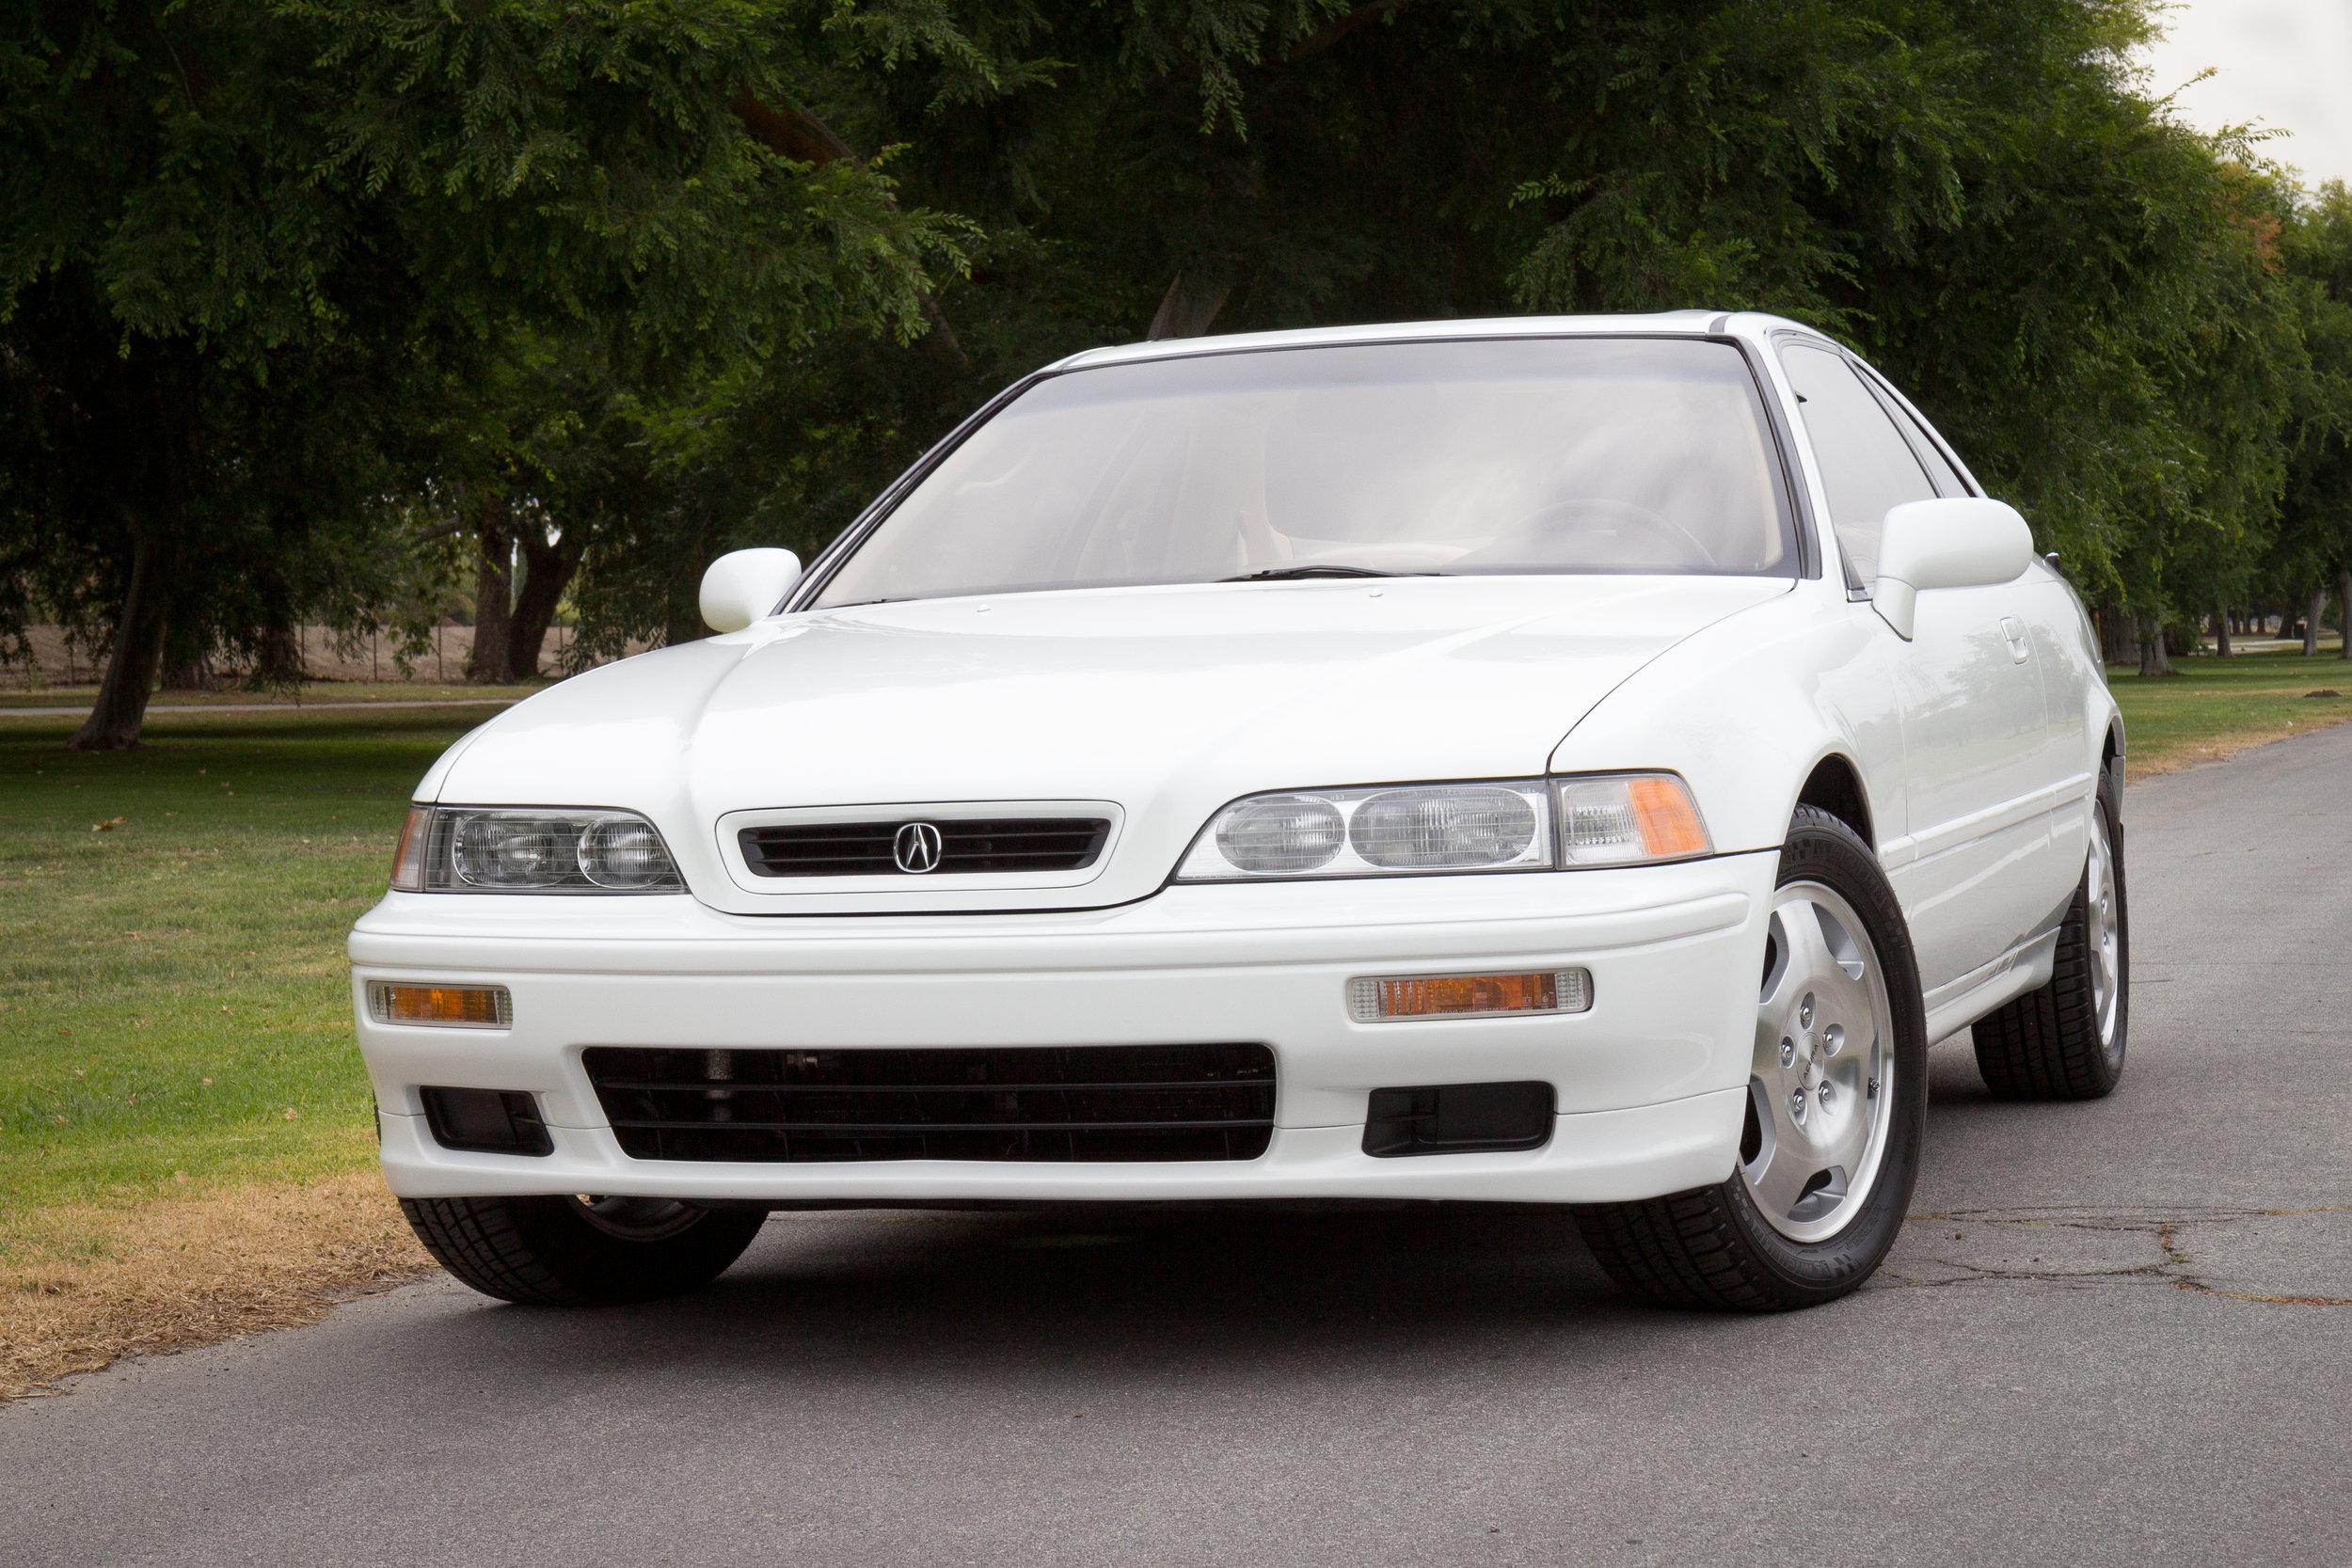 1994 Acura Legend Coupe-103.JPG